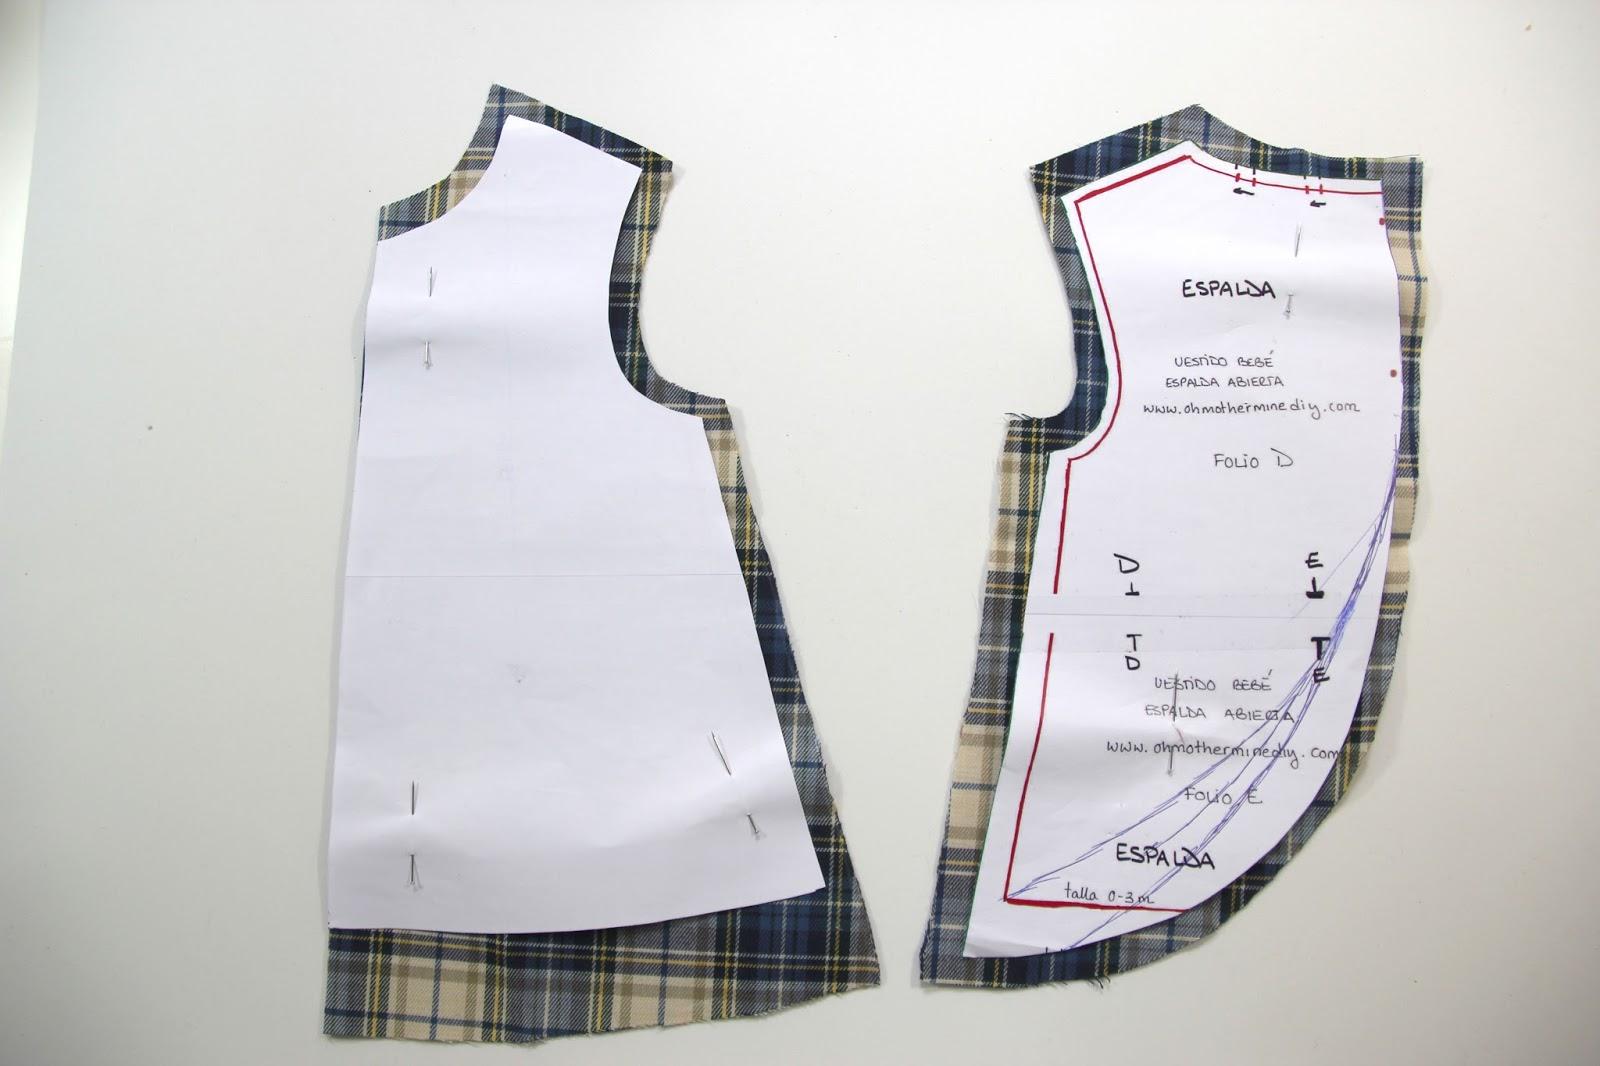 10 Trucos que debes saber para hacer tu propia ropa (PARTE 1)  3db434b0a8220